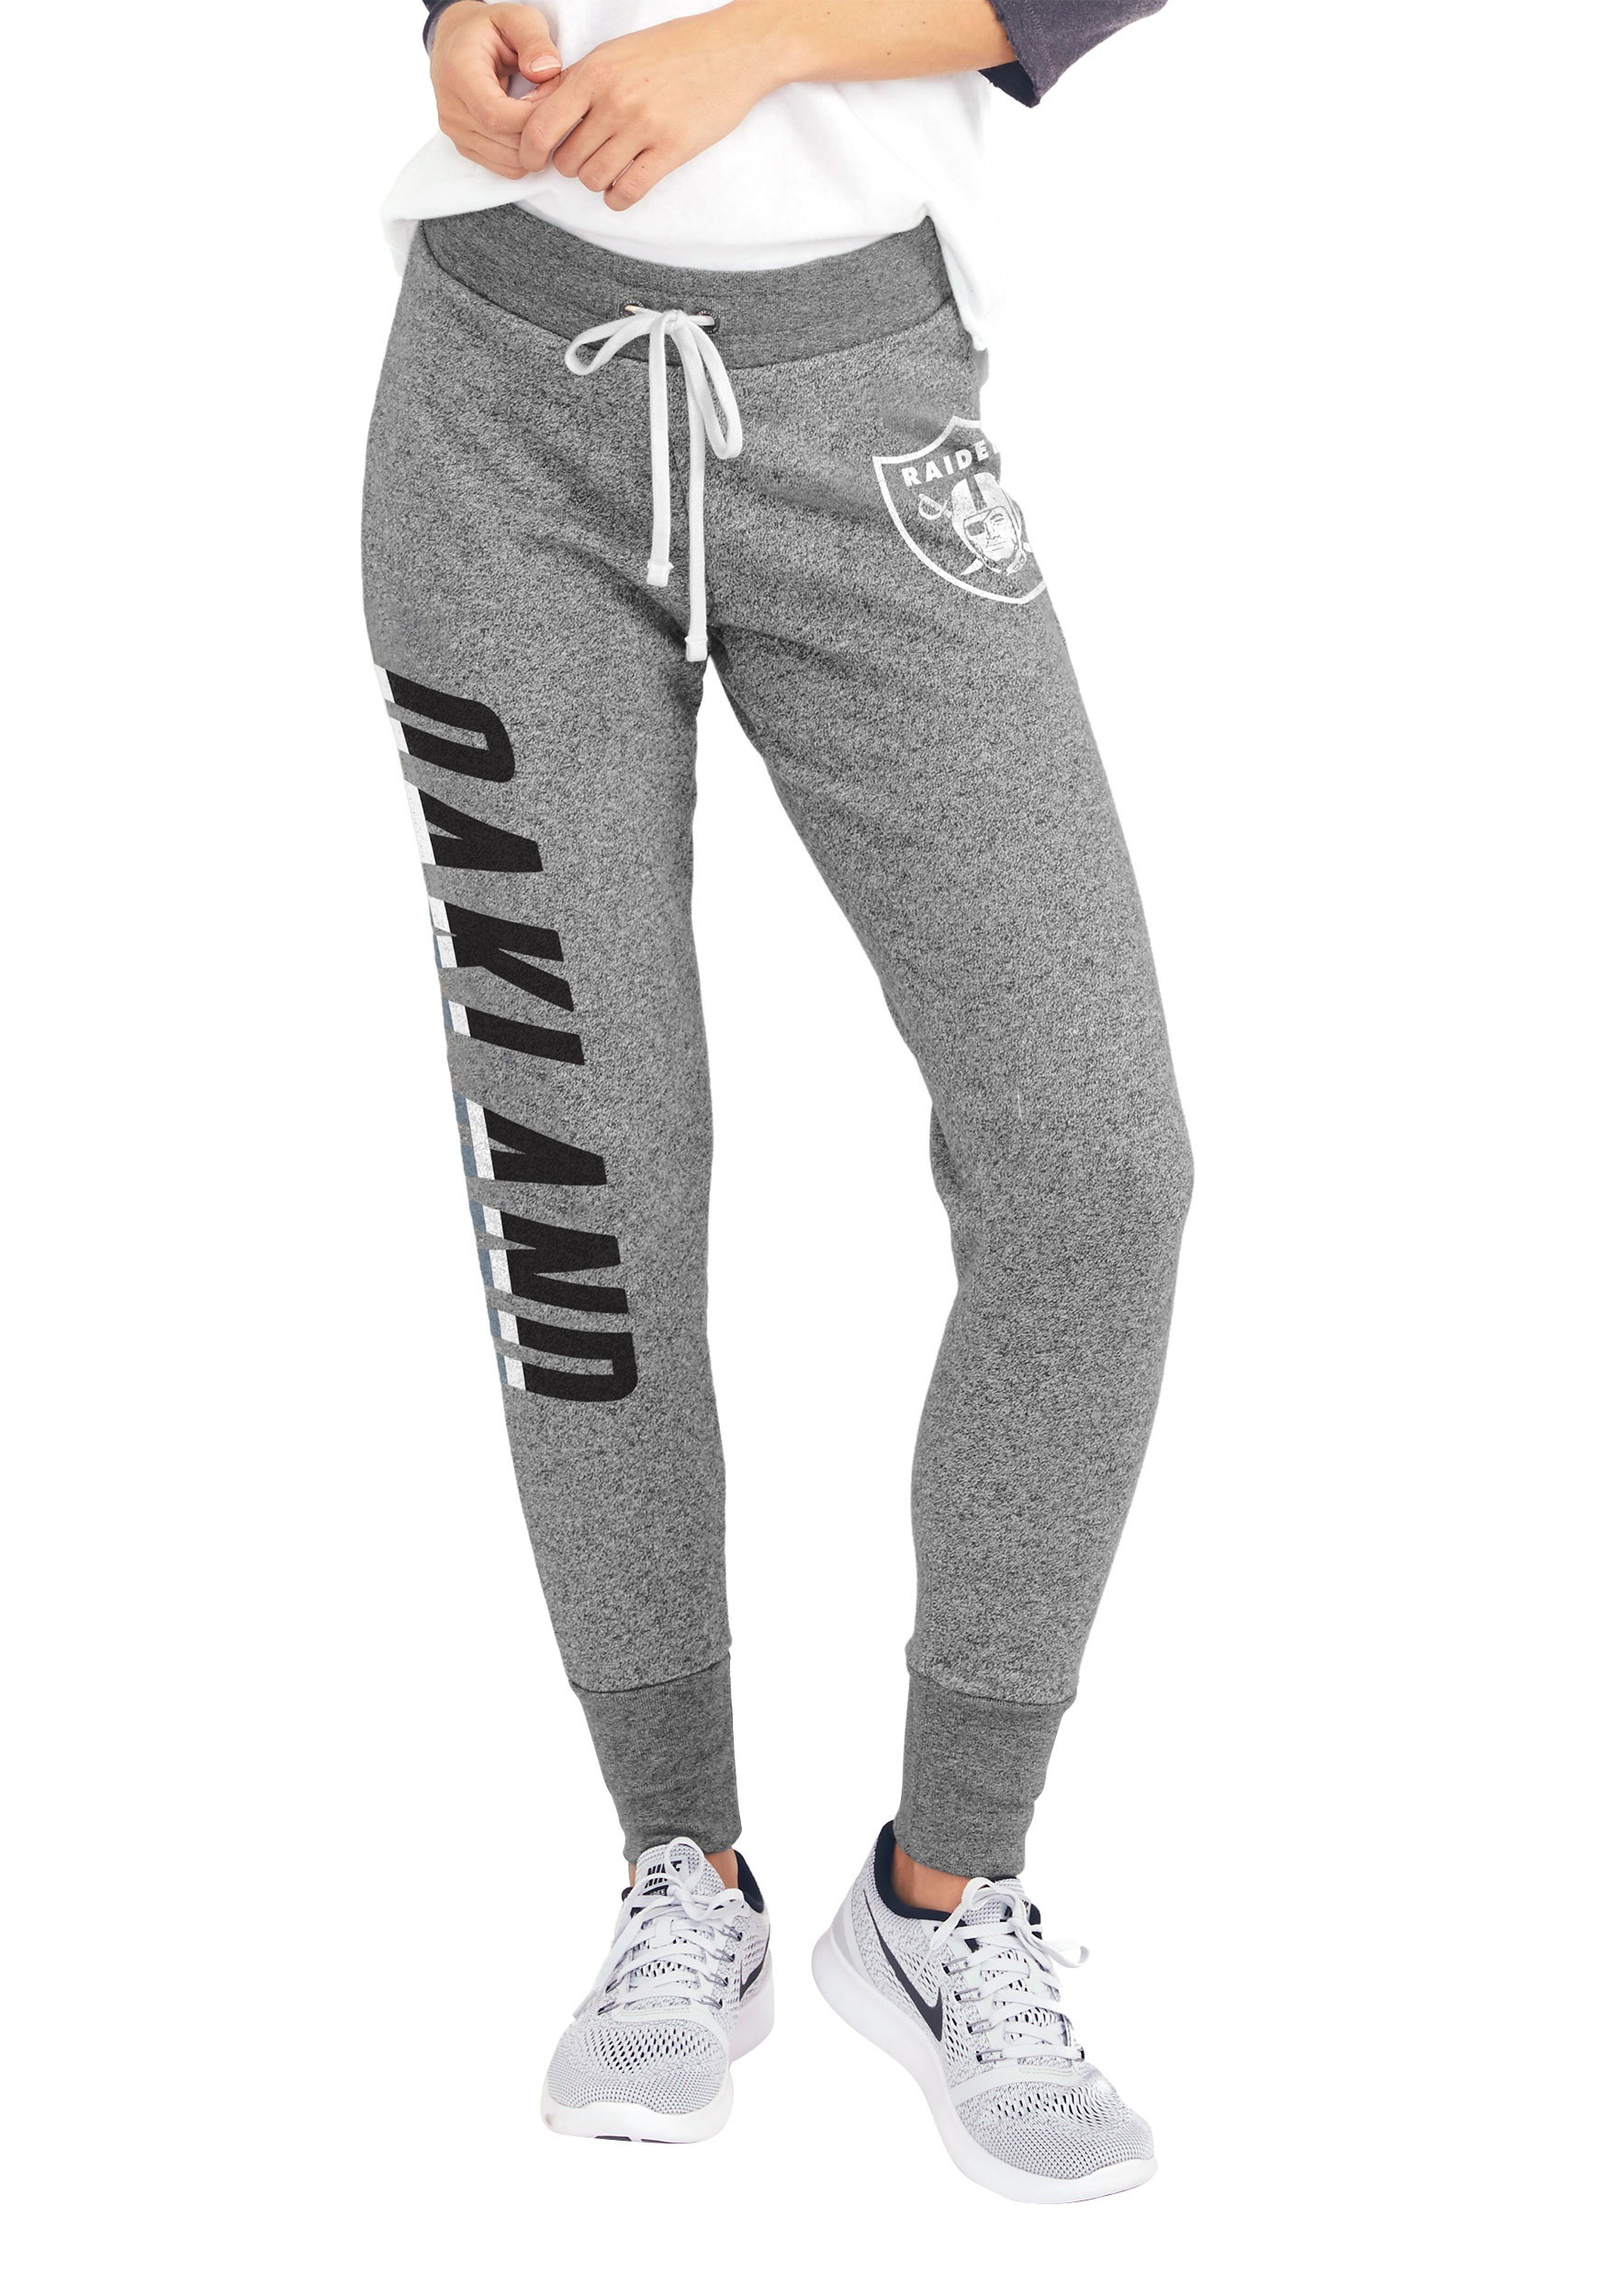 promo code e952d 5a4c6 Oakland Raiders Womens Sunday Sweatpants